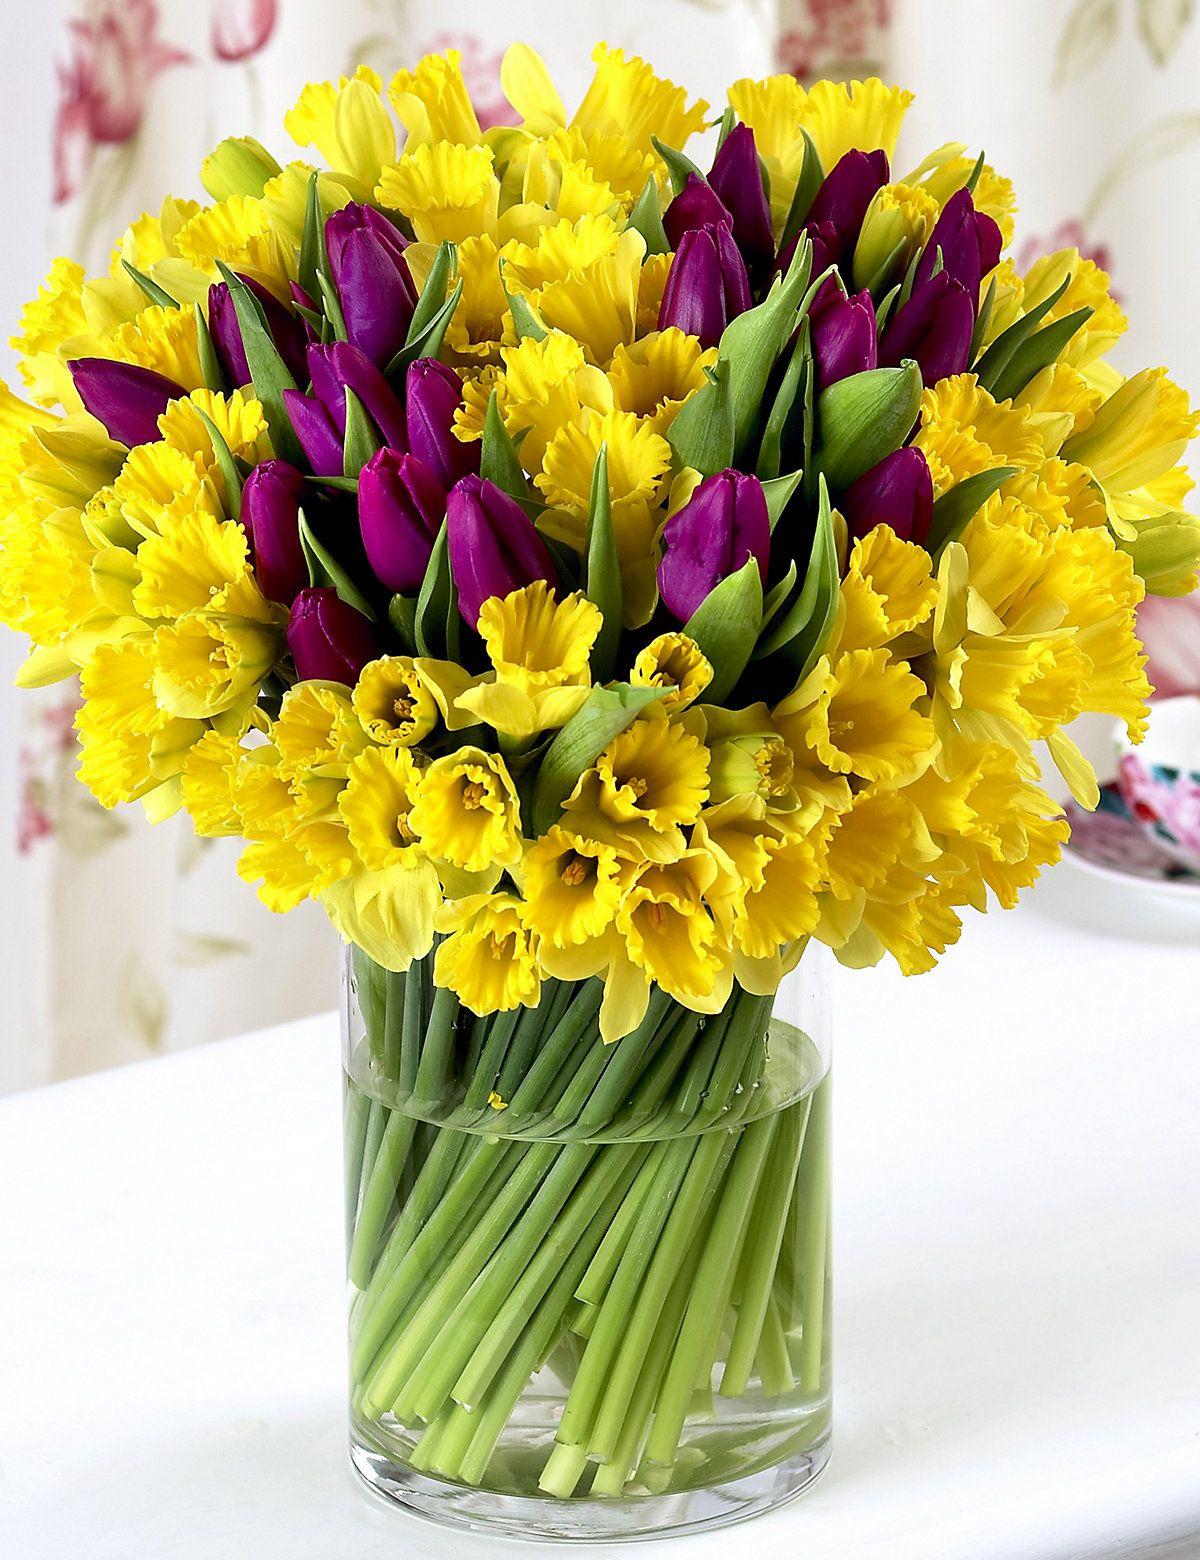 Pin by C. B. on Flowers Fresh flowers arrangements